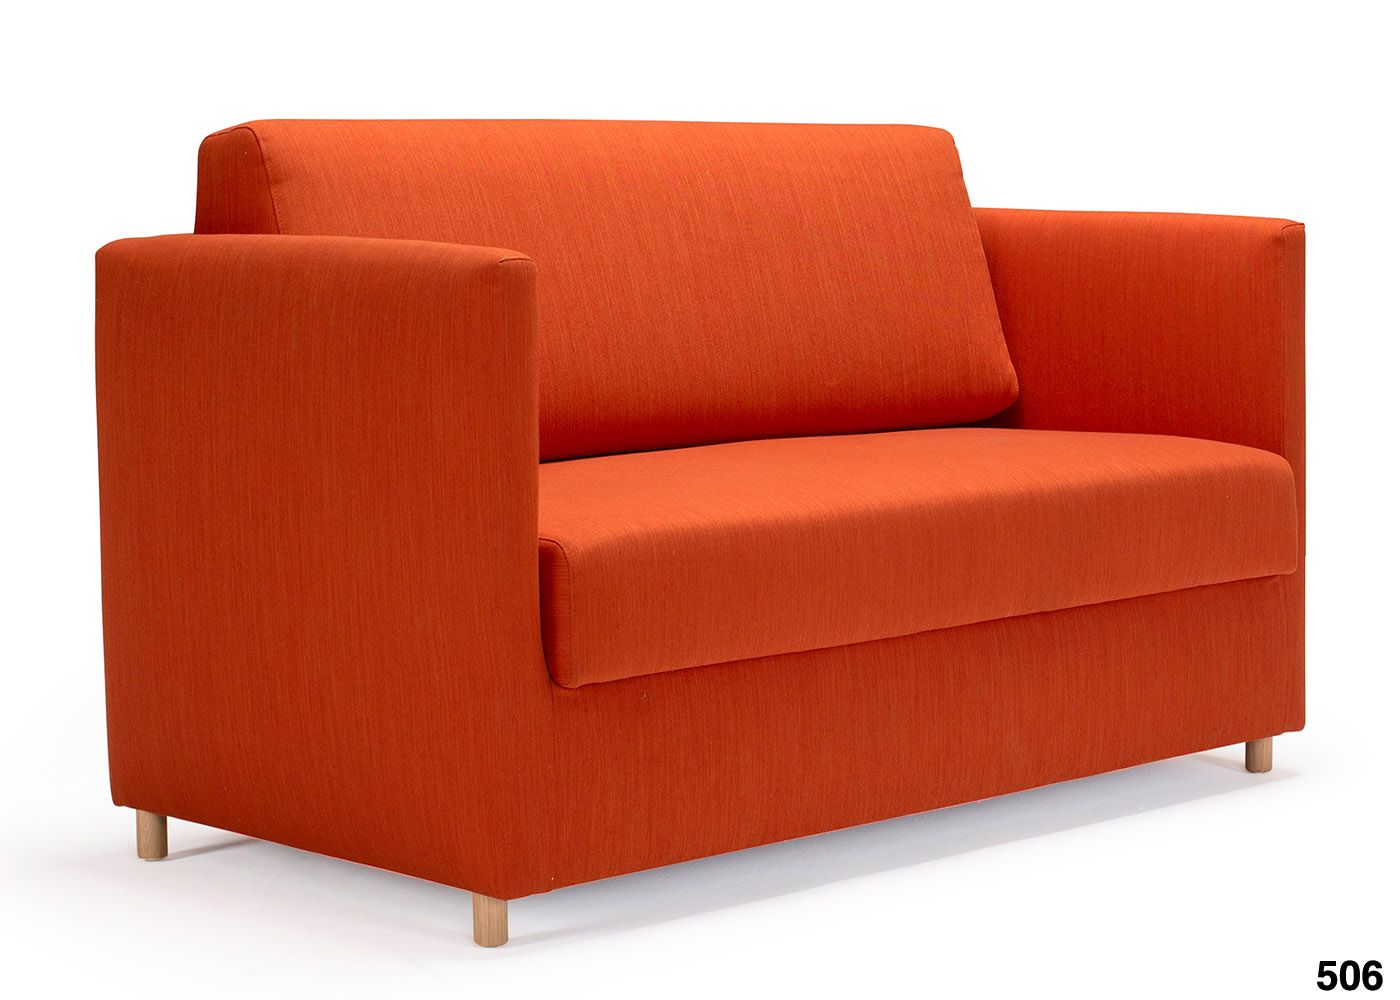 Canape Convertible En Lit 140x195 Special Petits Espaces L 159 Cm Olan Innovation Living Canape Convertible Design Canape Design Canape Original